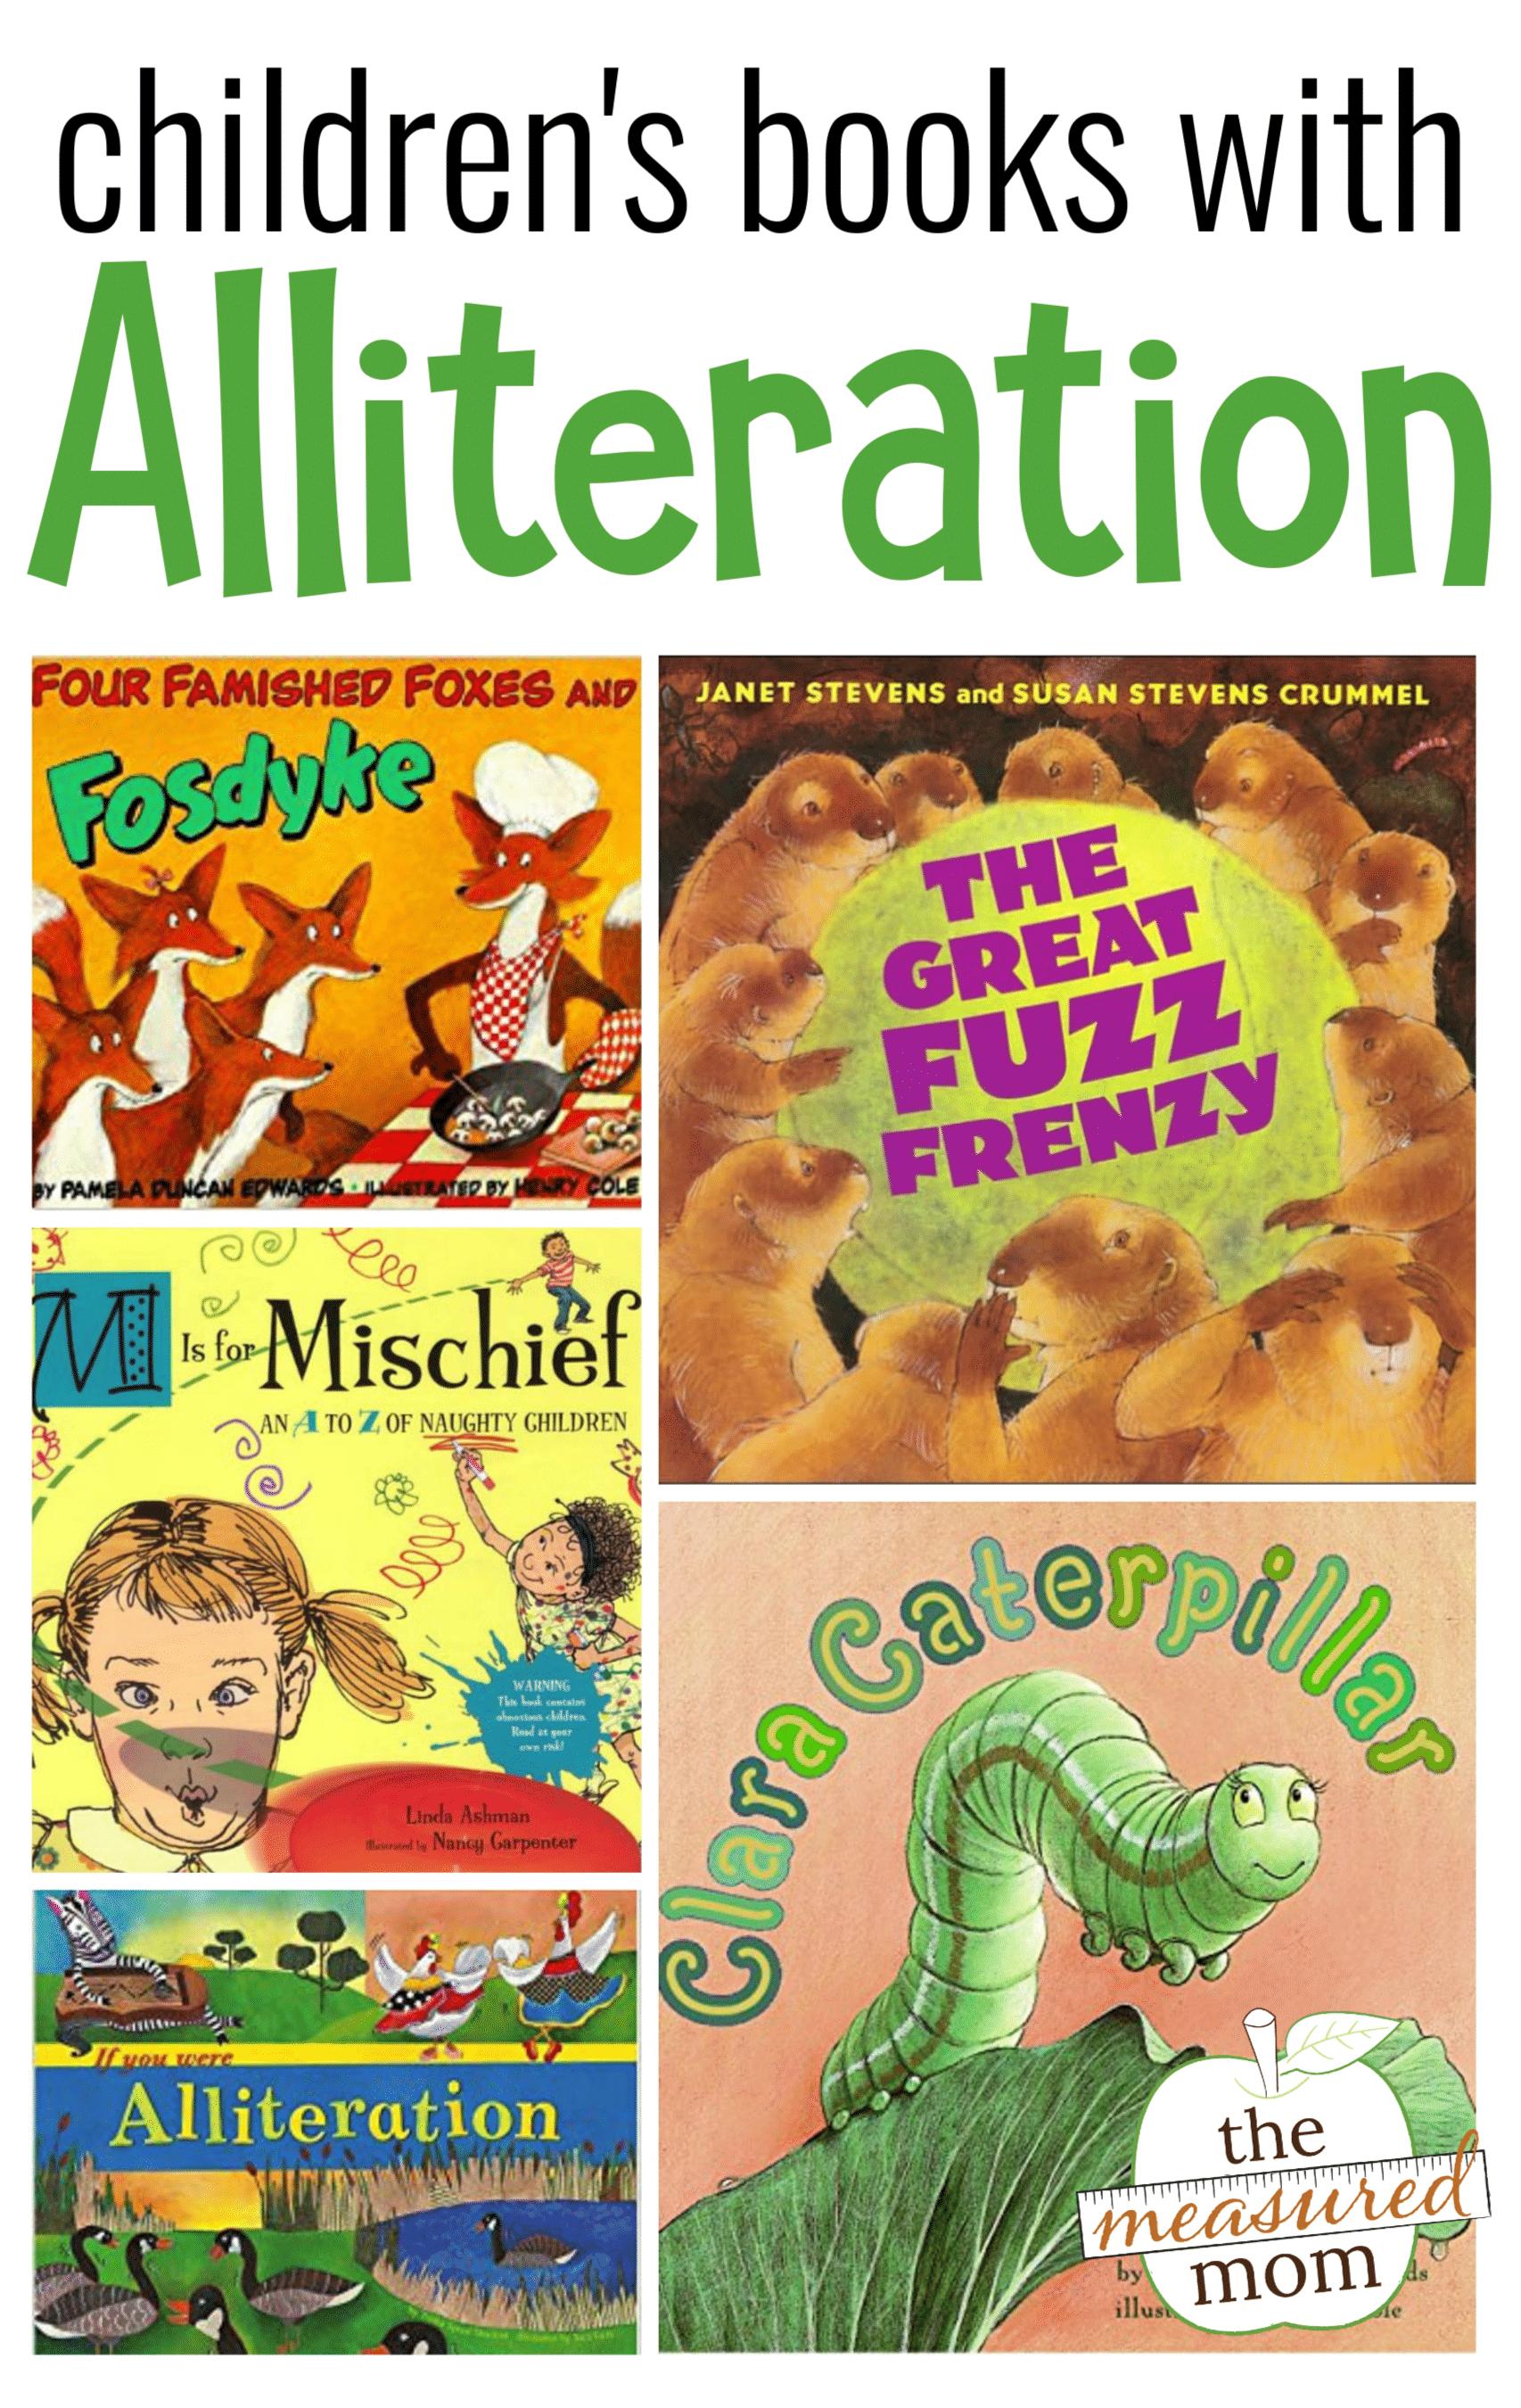 Never trust alliteration — matthew dicks.